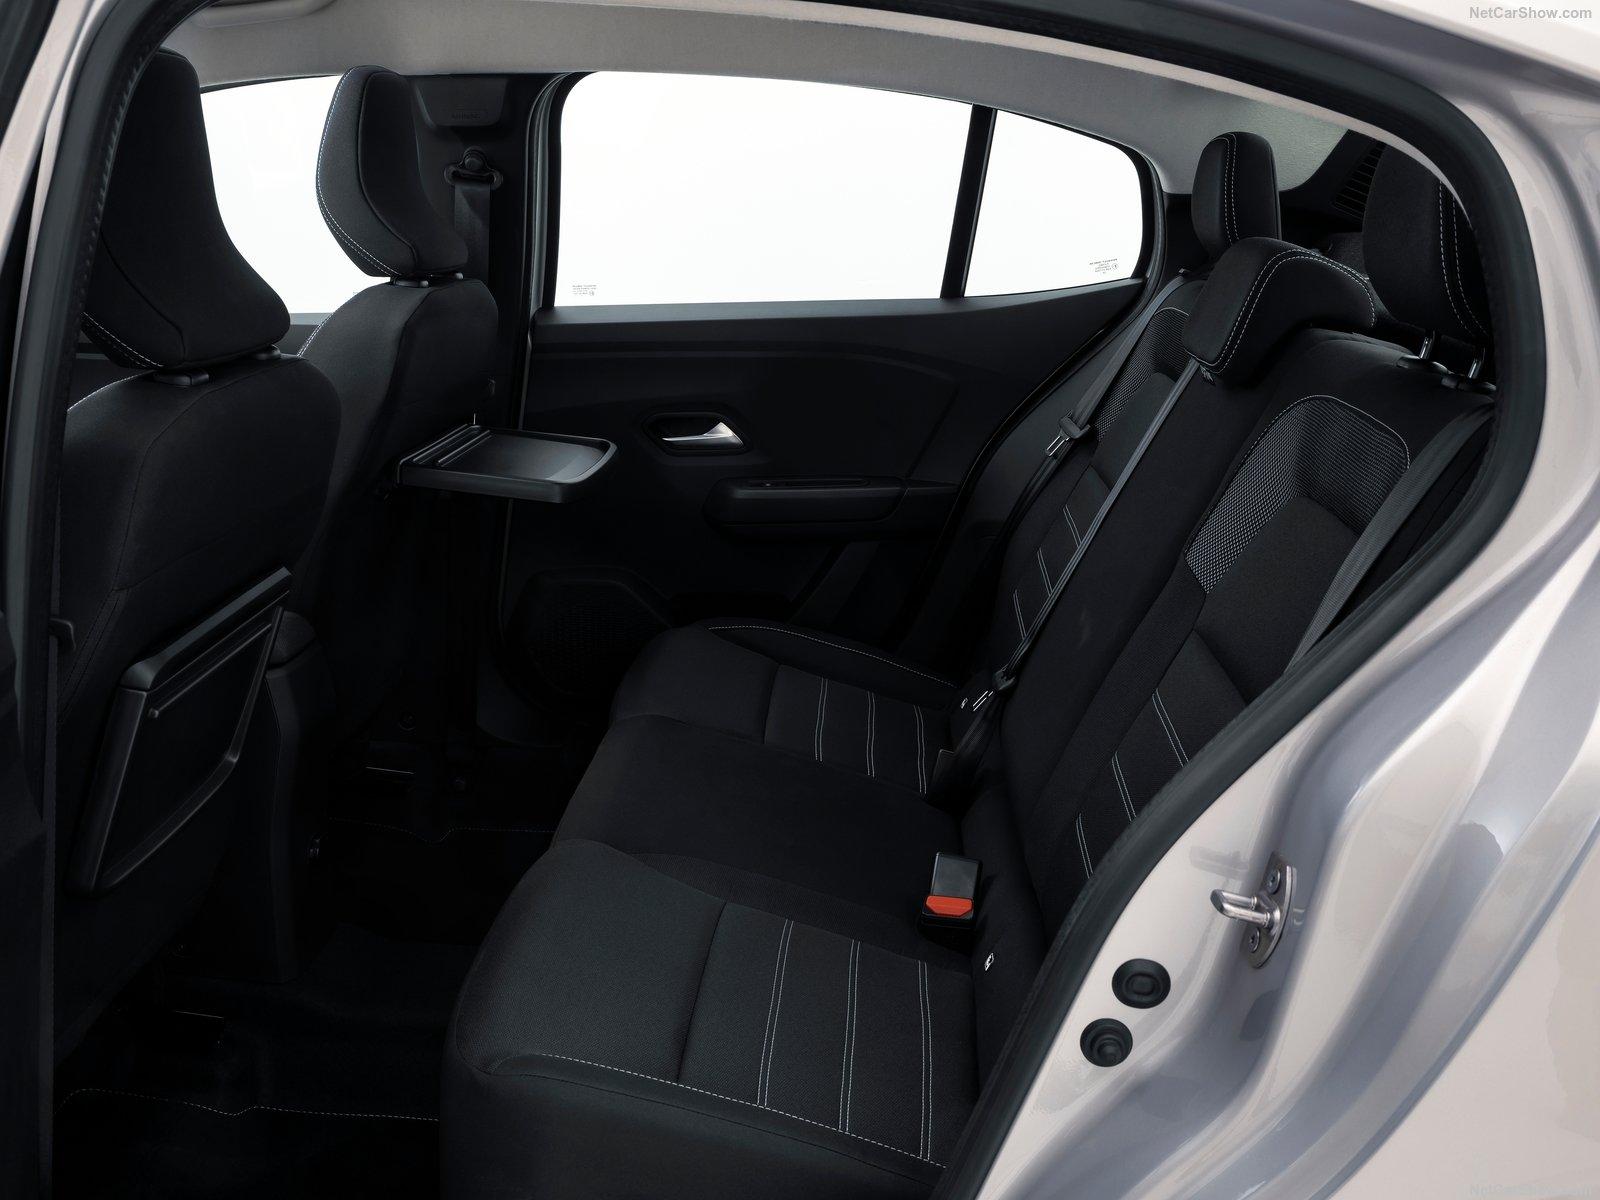 Dacia-Logan-2021-1600-0f